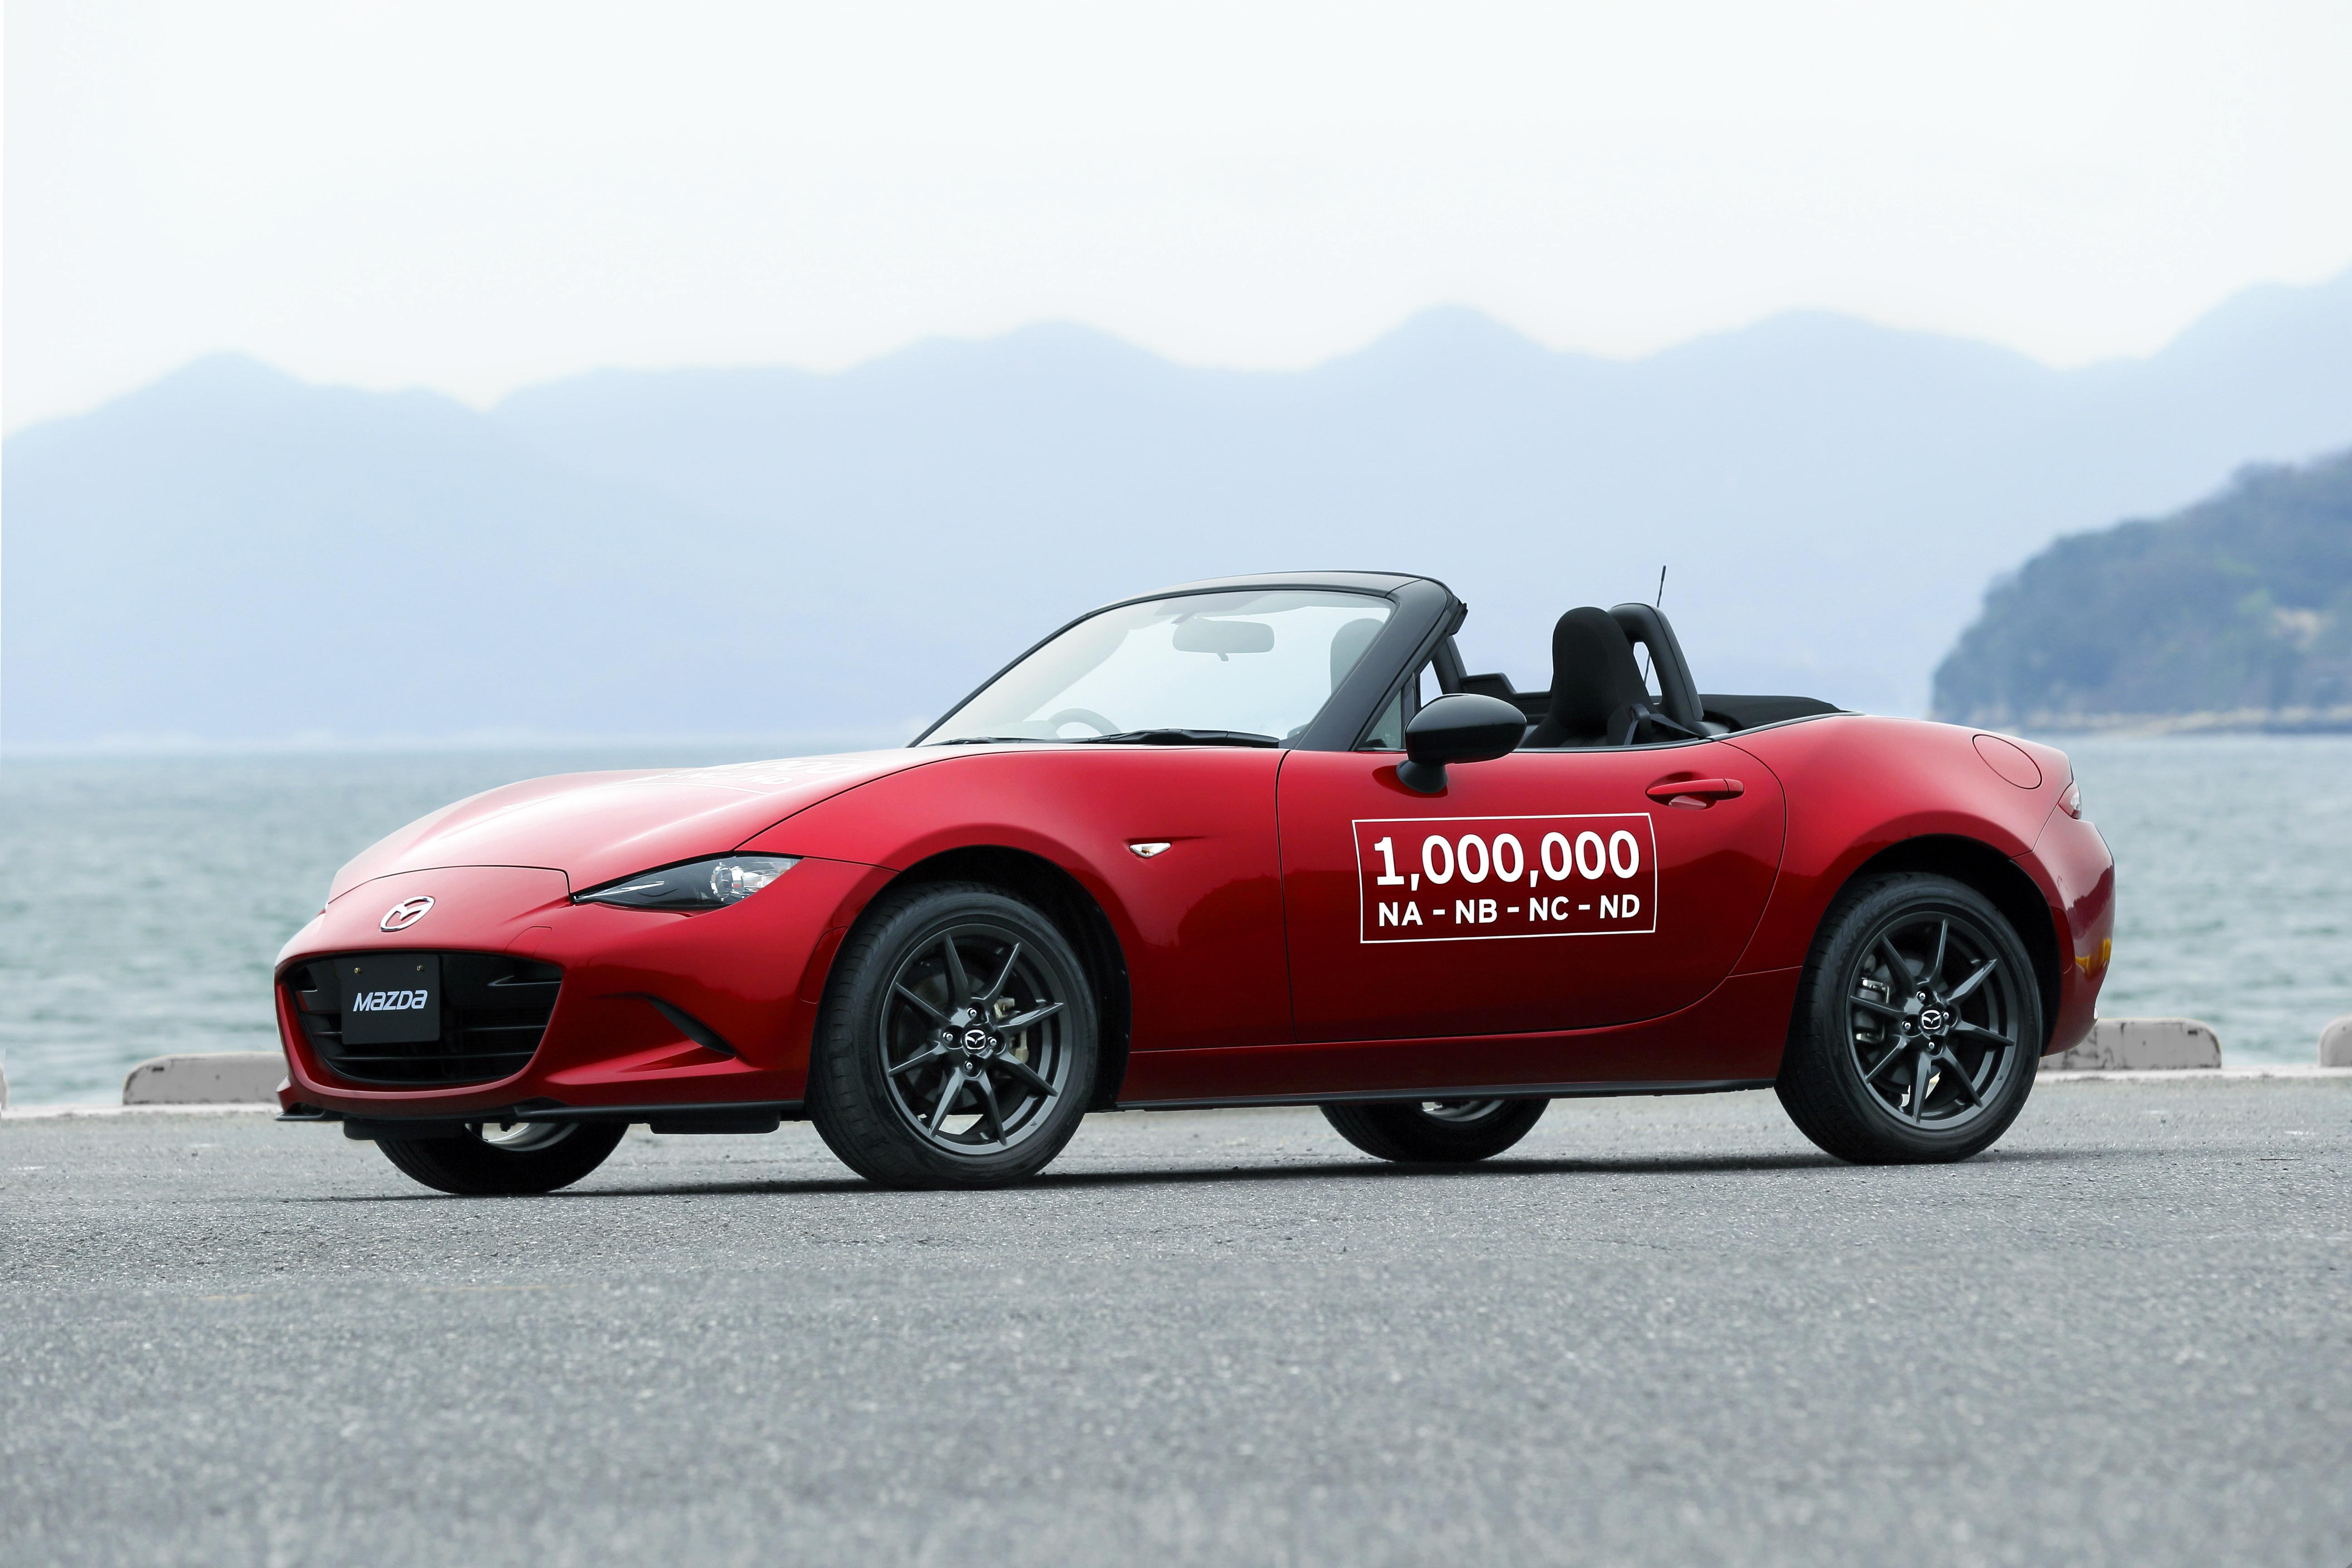 Mazda MX-5 1 miljoen - Autovisie.nl